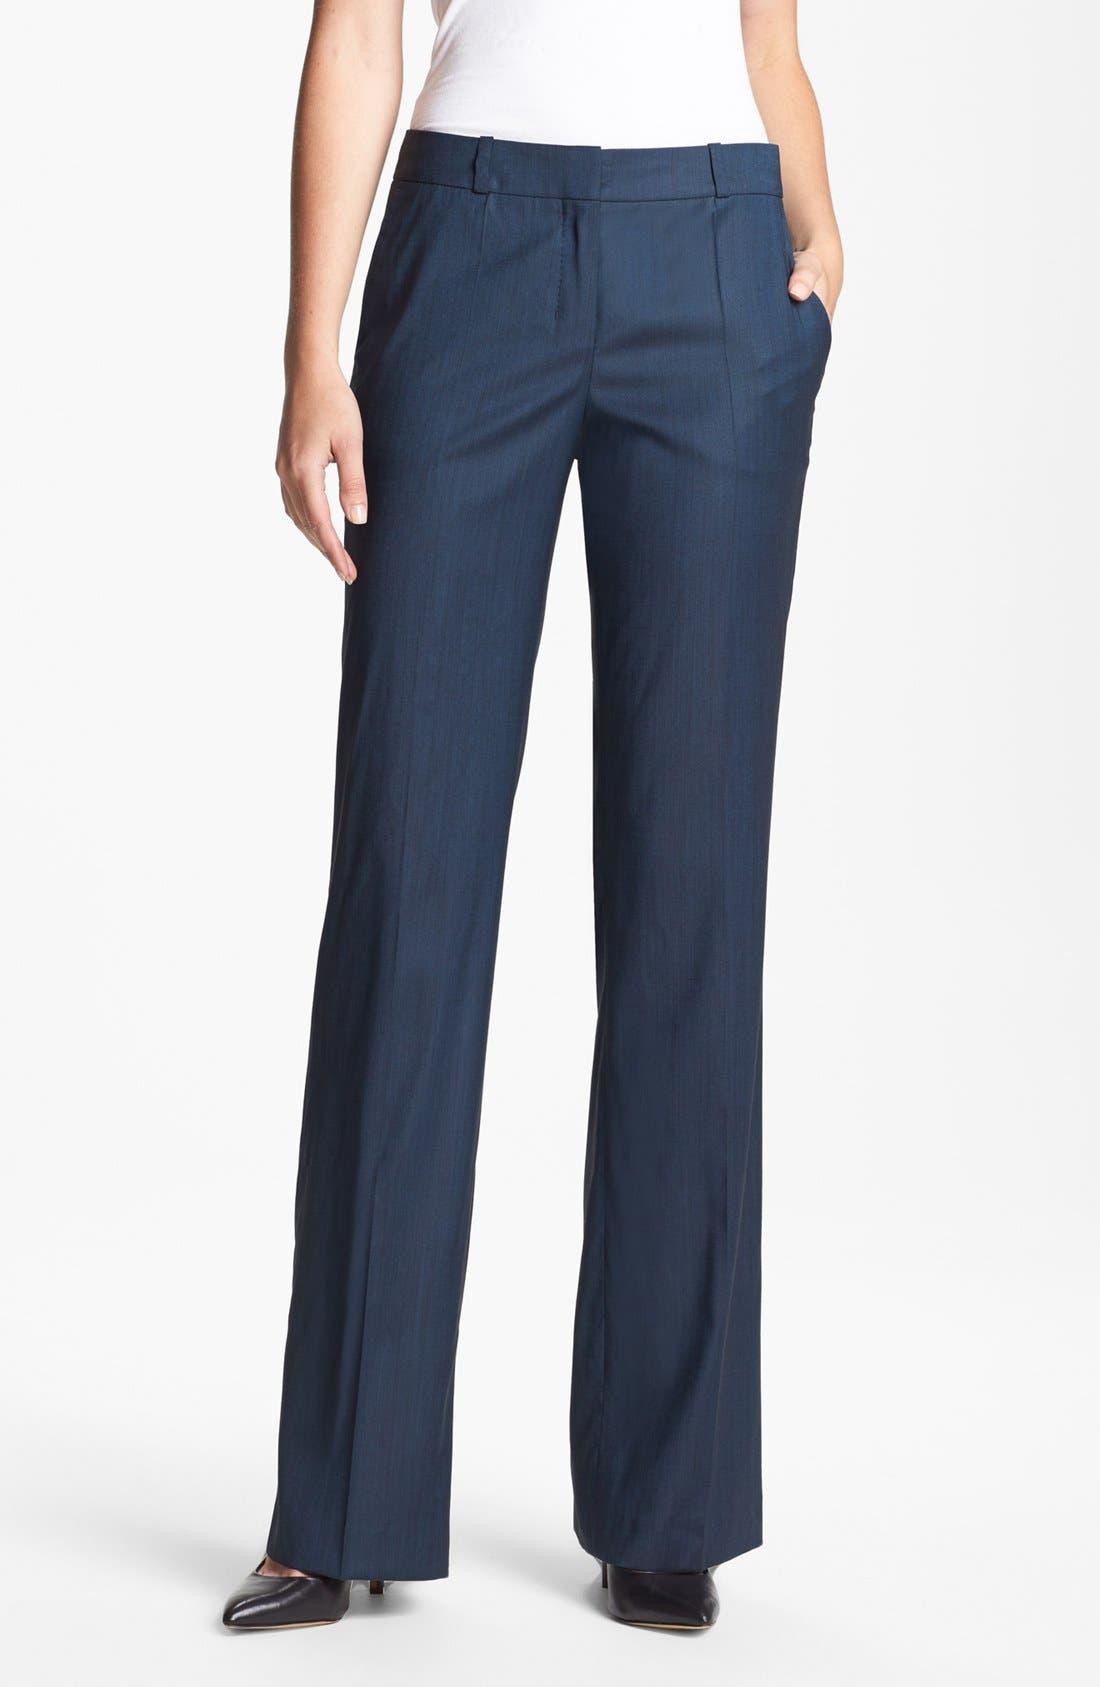 Alternate Image 1 Selected - BOSS HUGO BOSS 'Tulira' Trousers